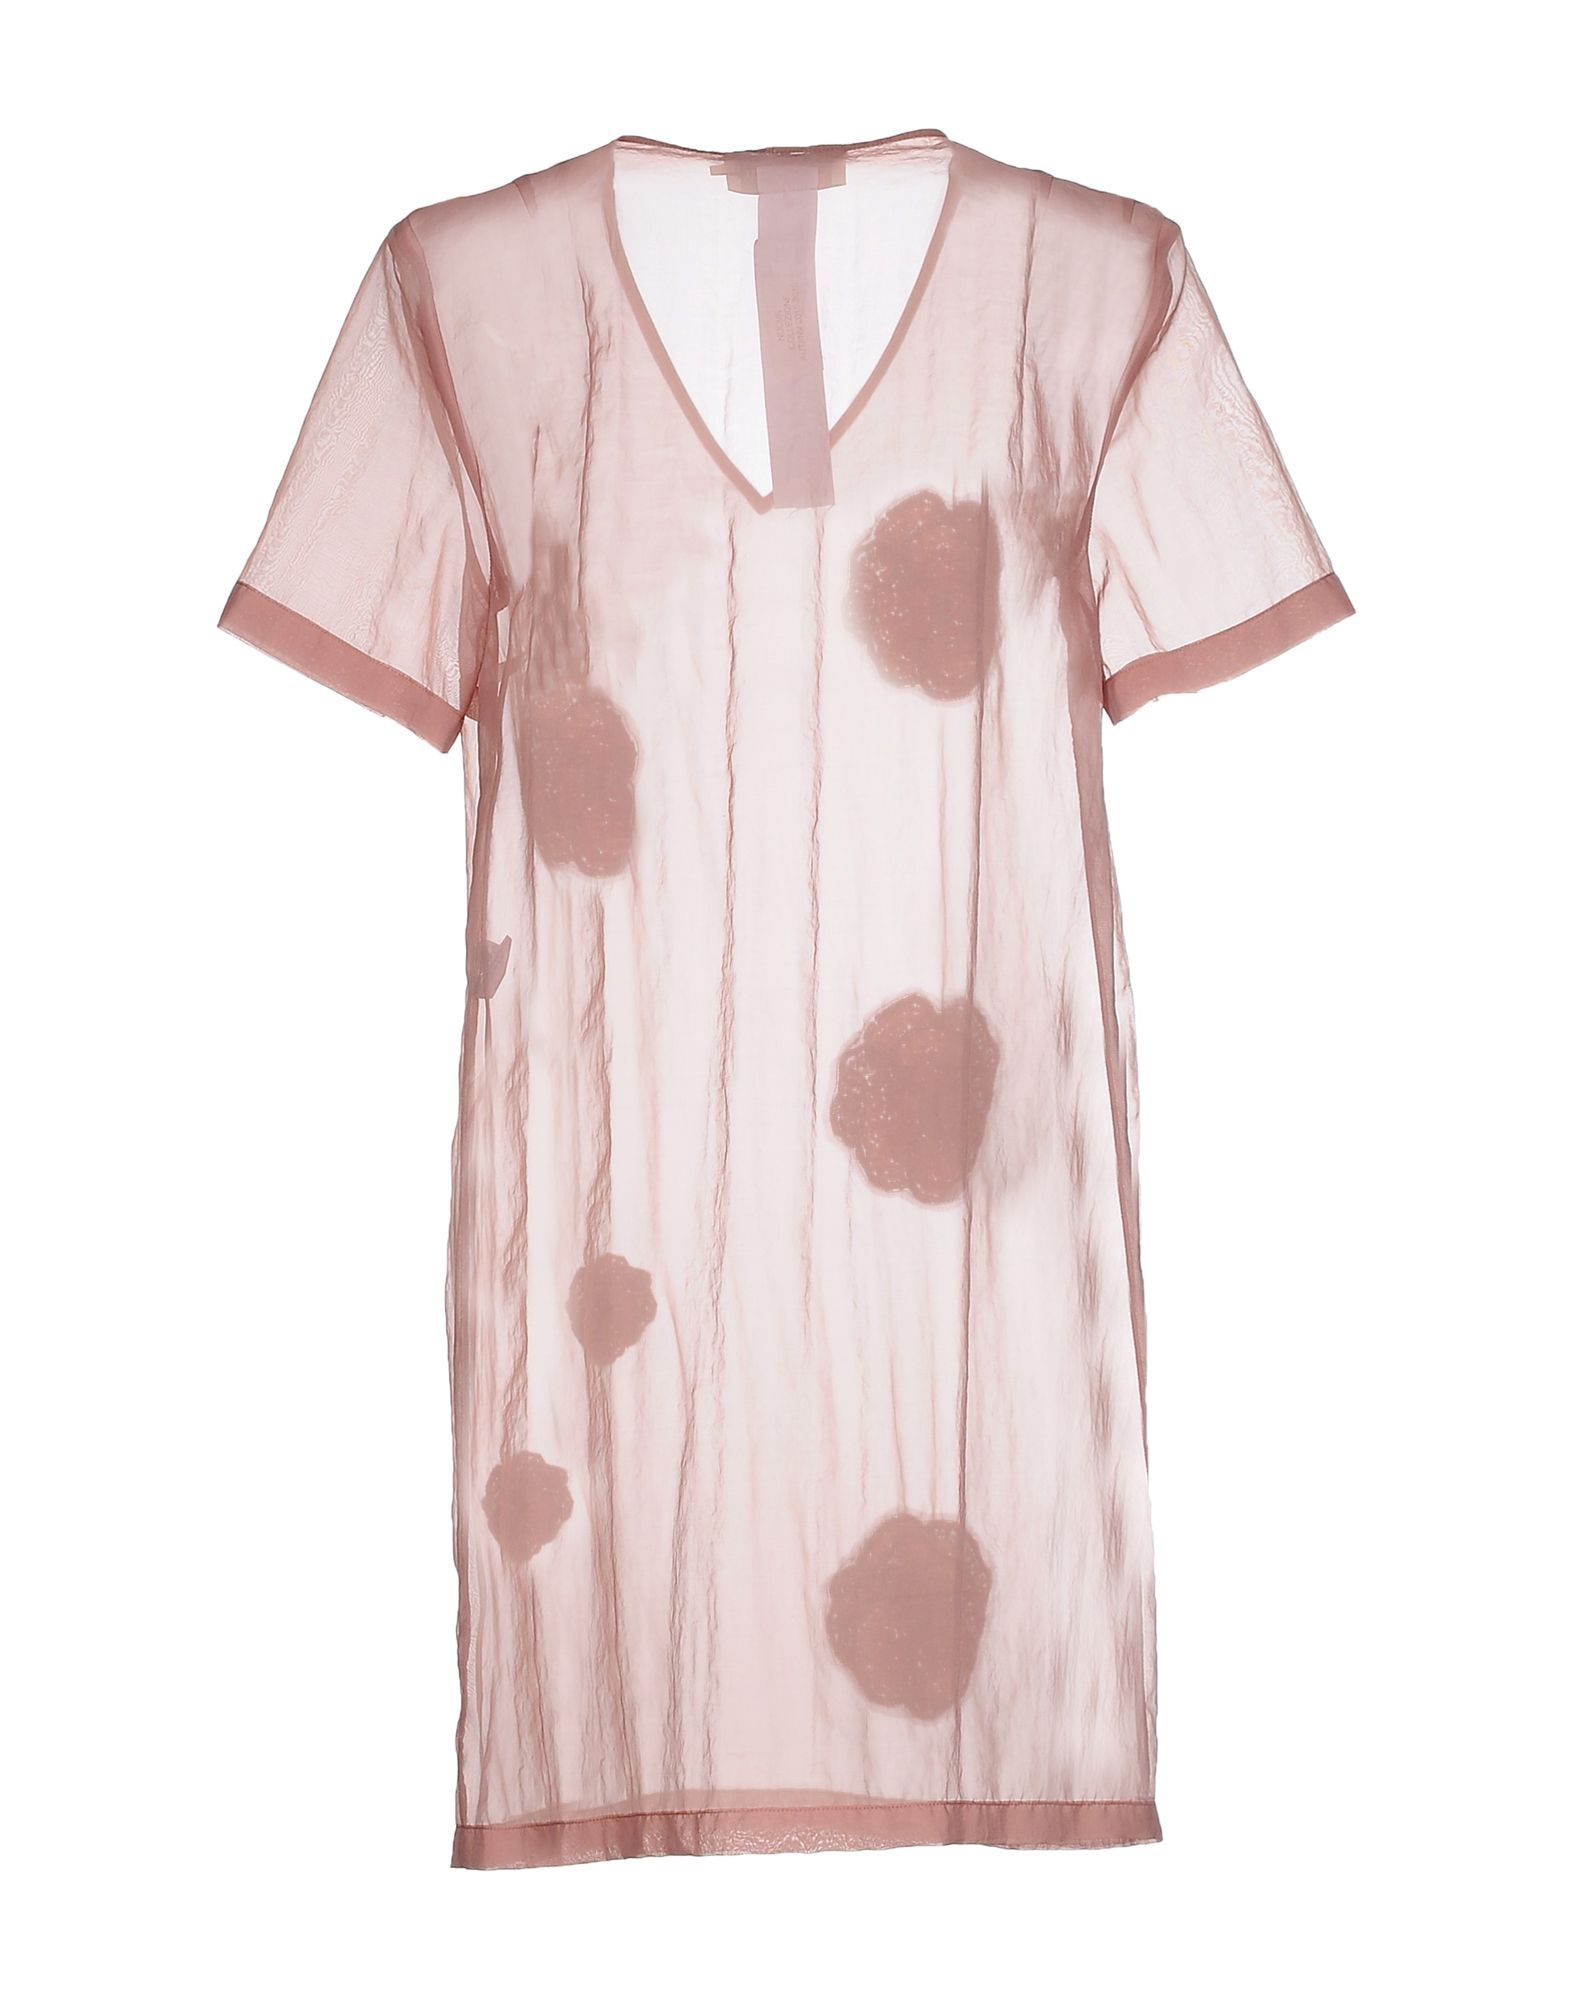 L' Autre Chose Pale Pink Organza And Sequin Short Sleeve Dress